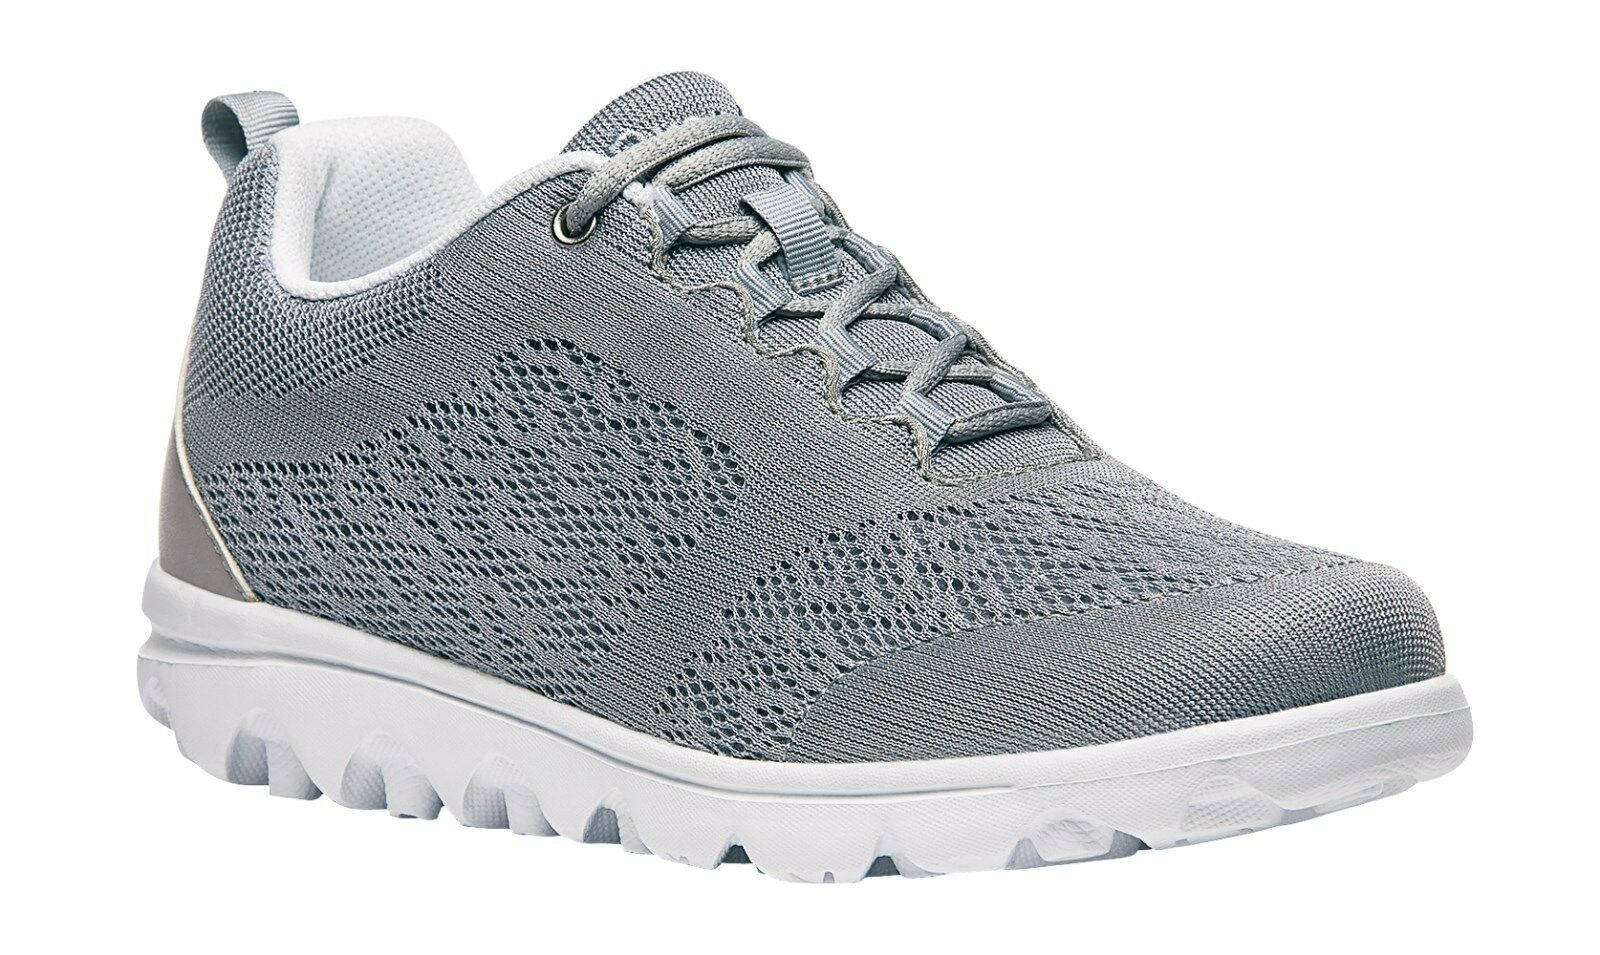 Propet Damens TravelActiv W5102 - Light weight fashion walking sneaker schuhe